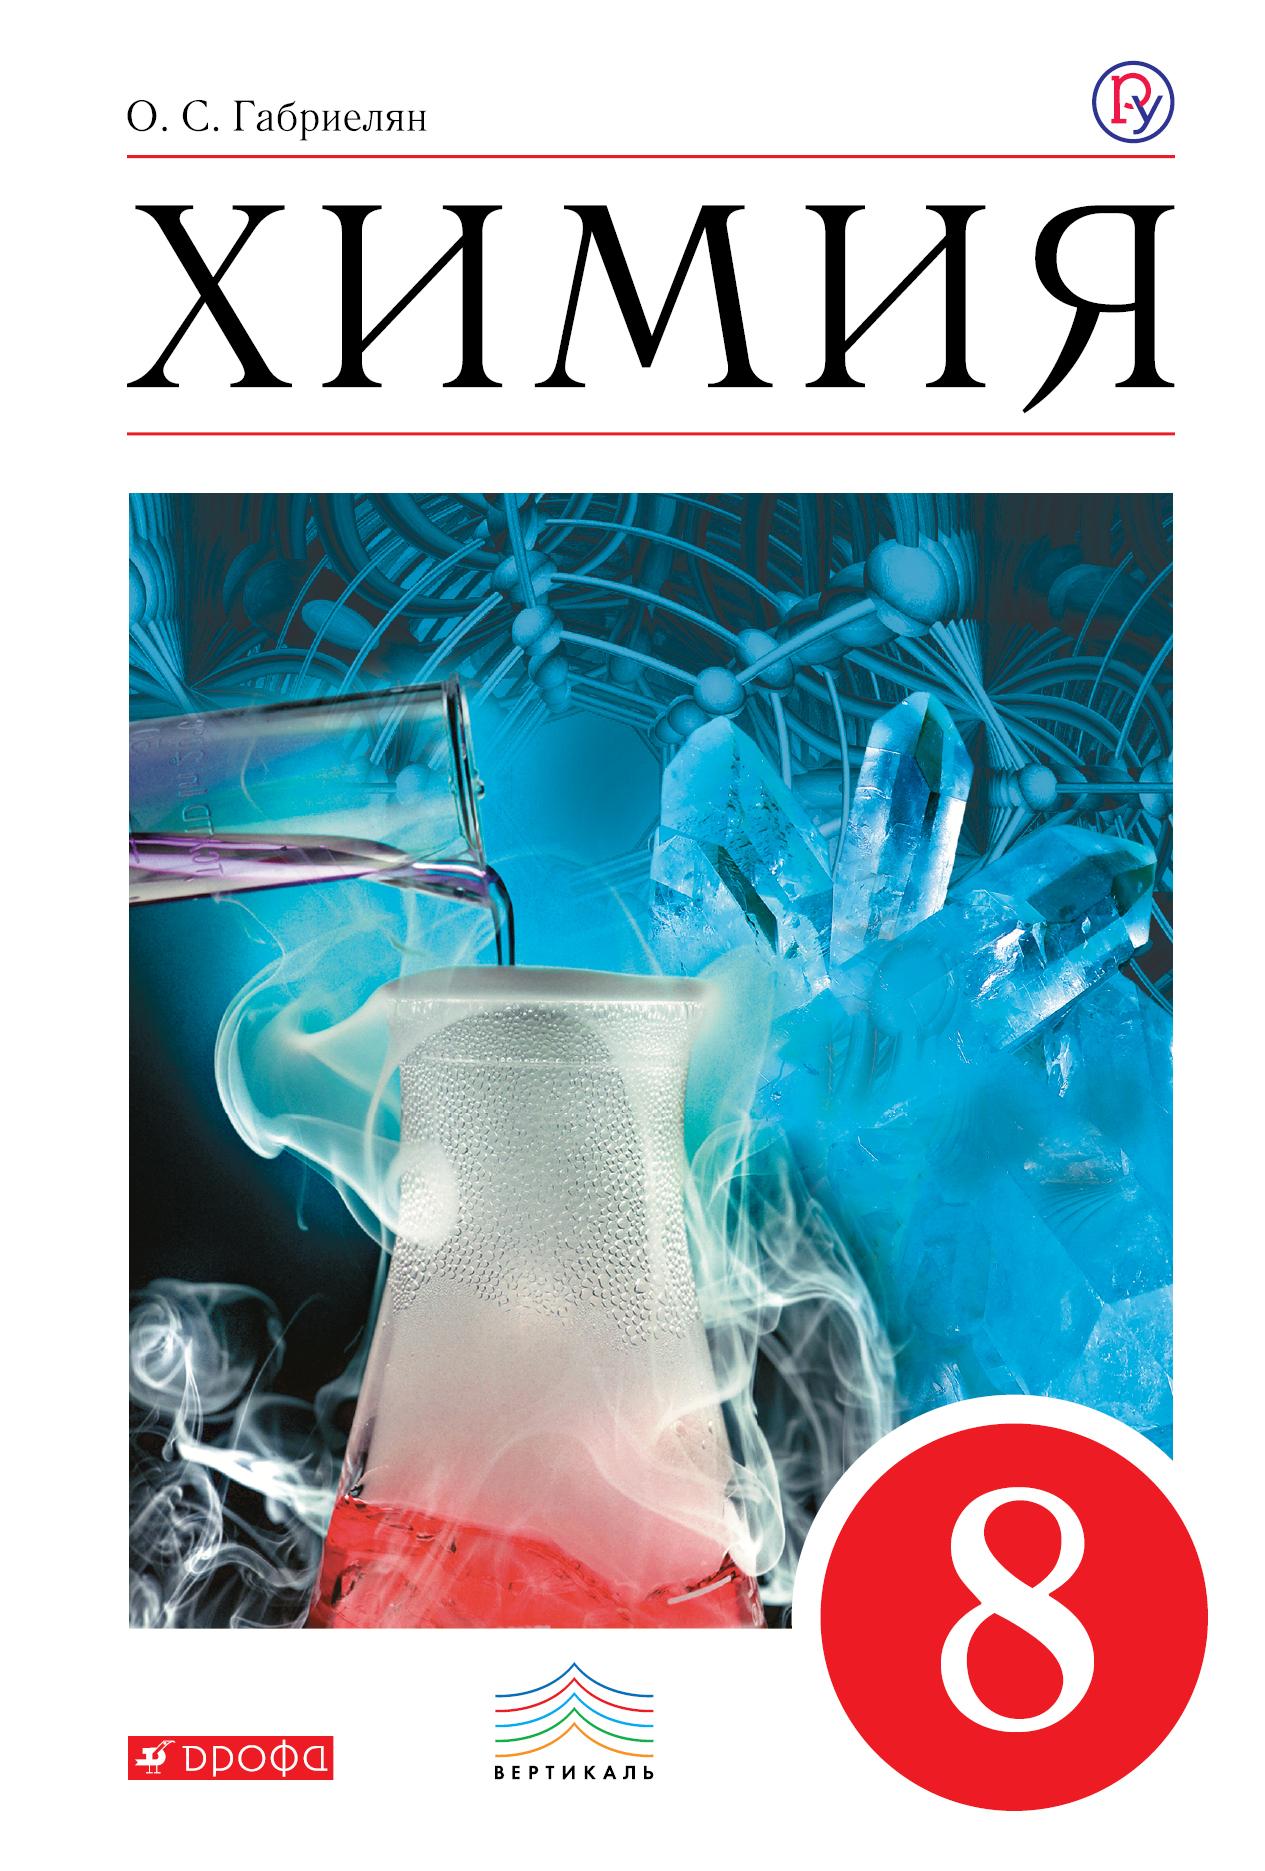 Габриелян О.С. Химия. 8 класс. Учебник химия 8 класс учебник фгос